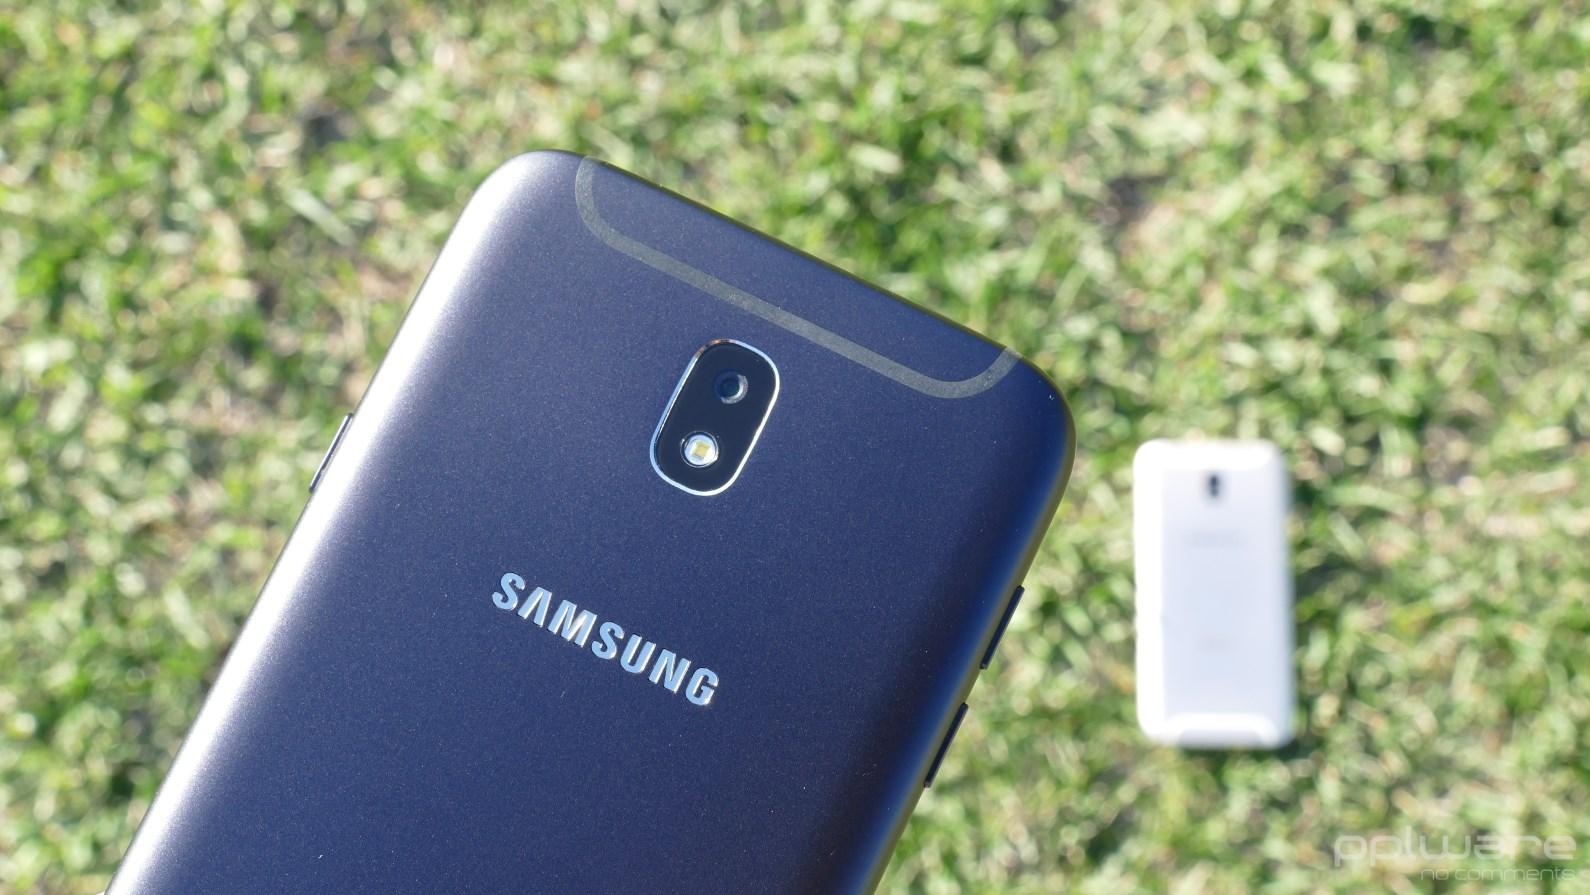 Samsung Galaxy J7 e Galaxy J5 (2017), será que valem a pena?